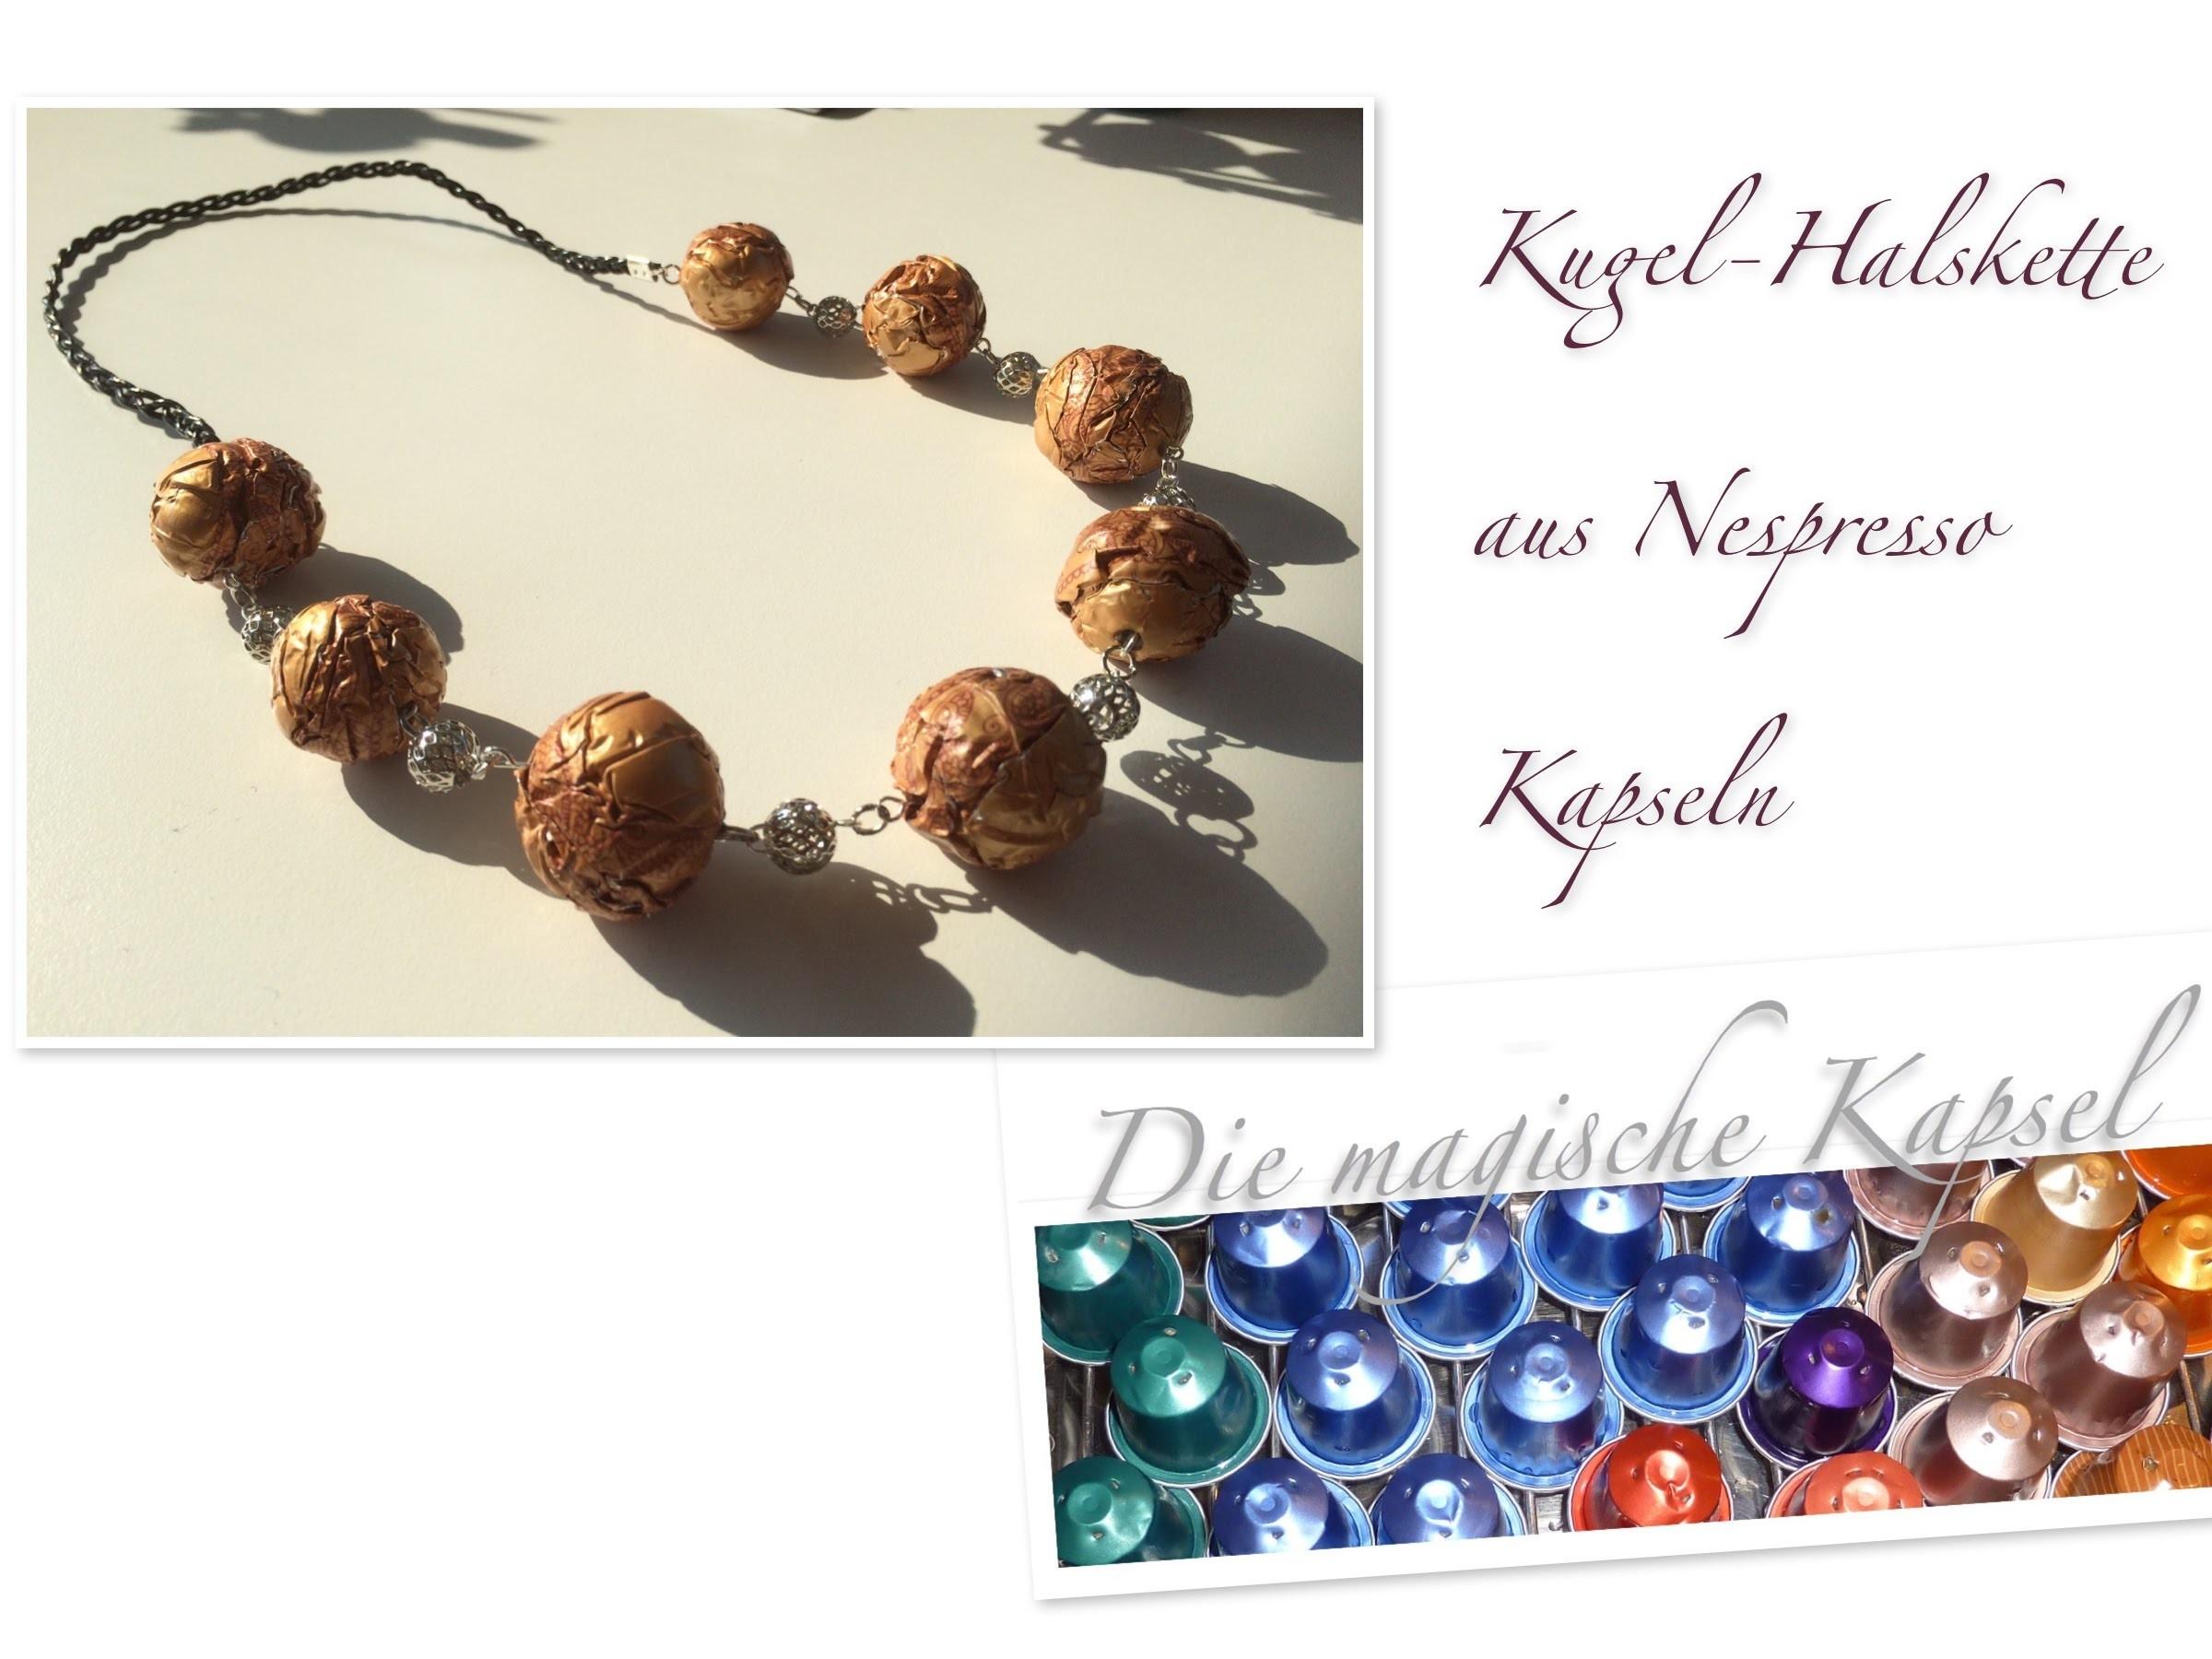 Nespresso Kapsel Schmuck Anleitung - Kugel-Halskette - die magische (Kaffee)-Kapsel